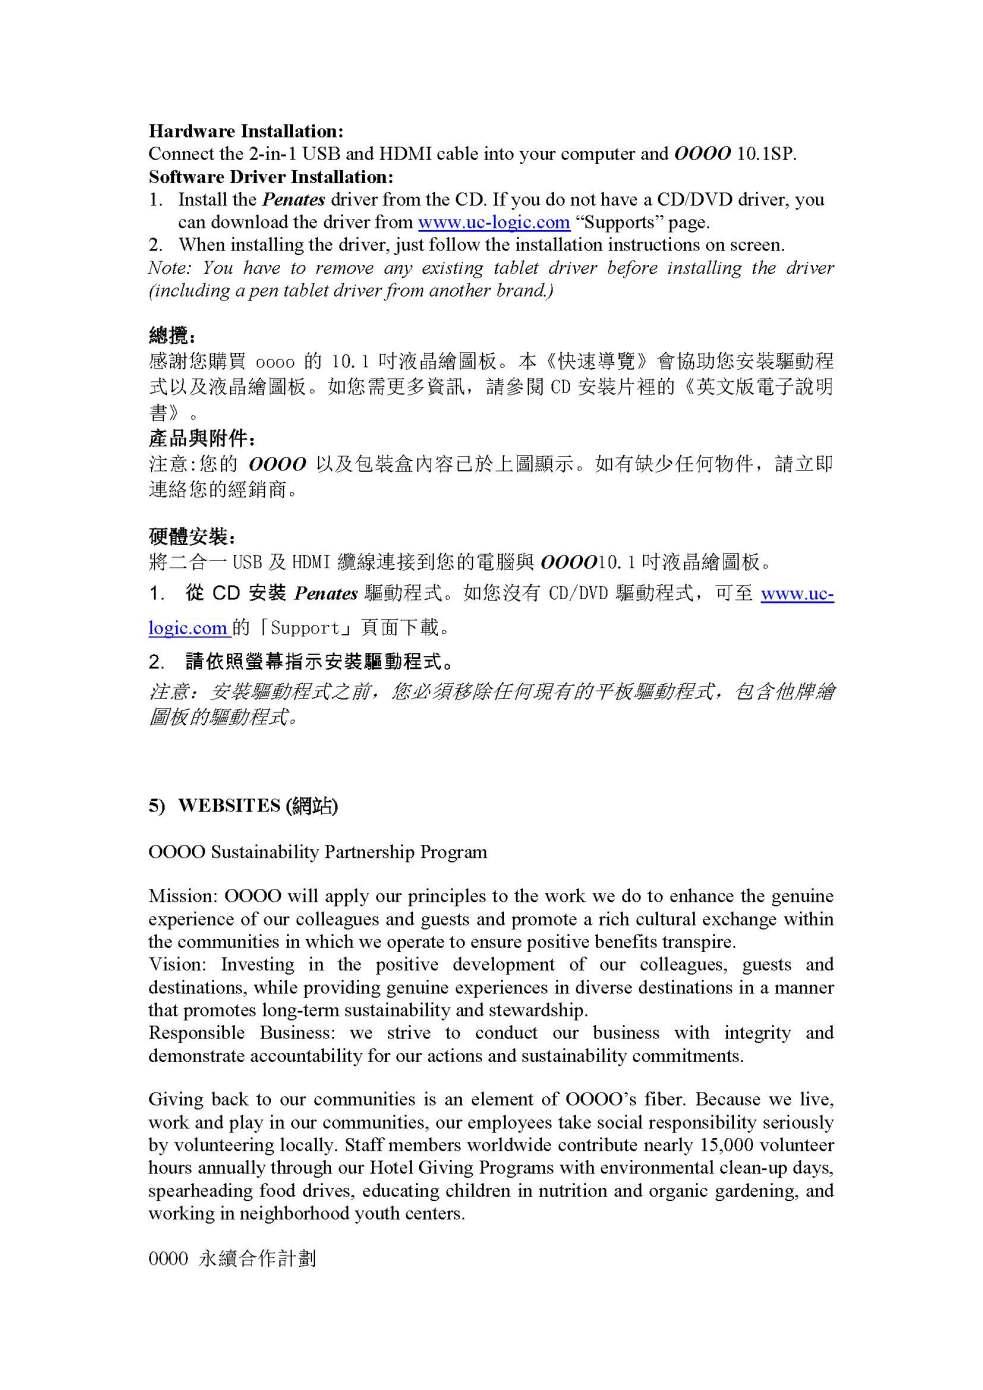 E-C FreelancerPortal_TranslationTestEN.docx_頁面_4